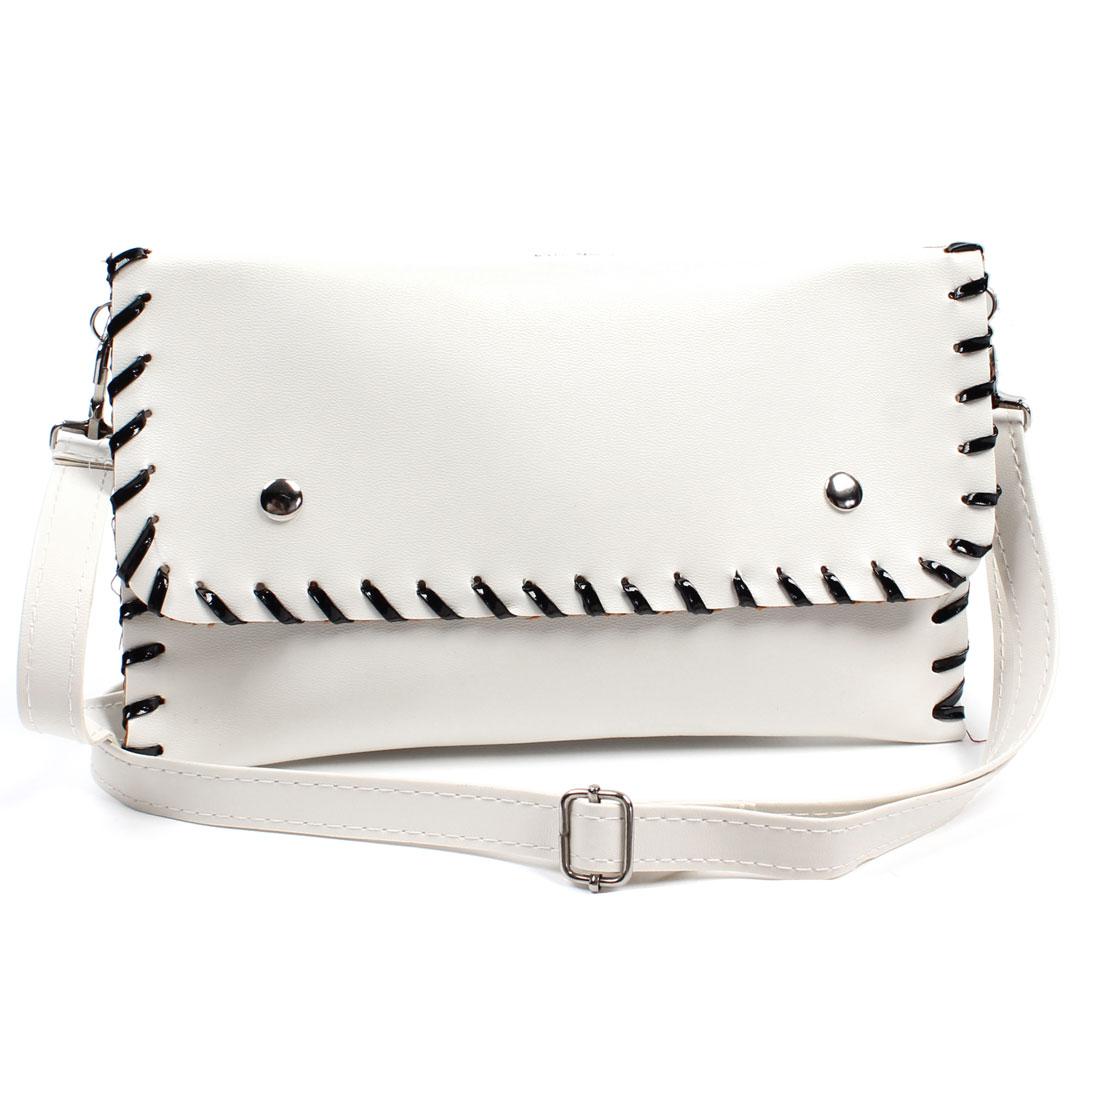 Black Faux Leather Stitched Hem Shoulder Bag Handbag Pure White for Ladies